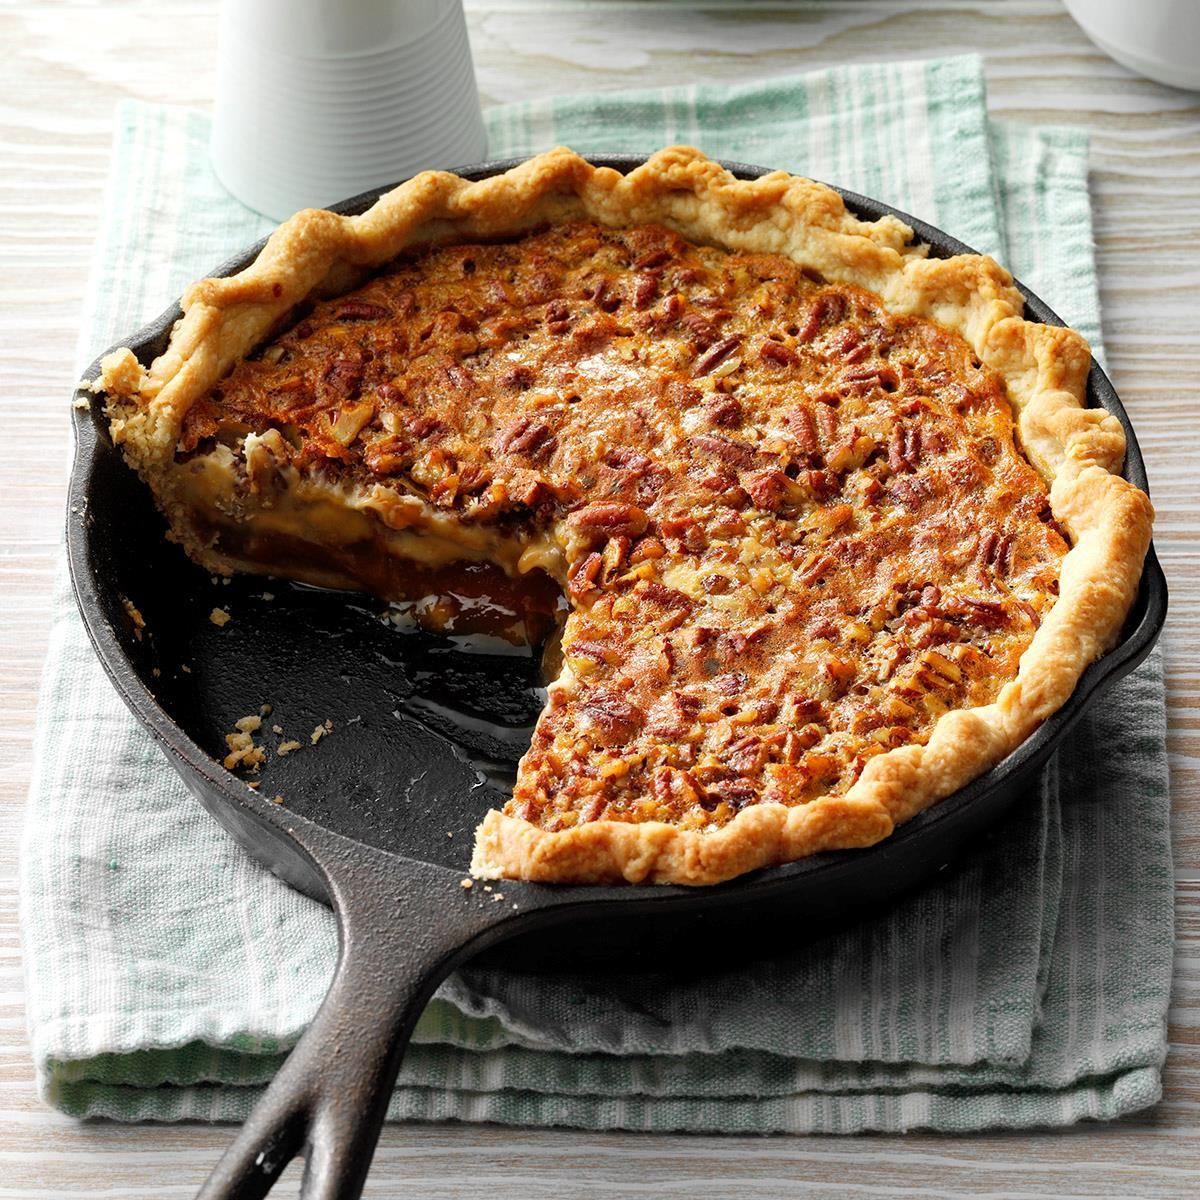 Caramel-Pecan Cheesecake Pie